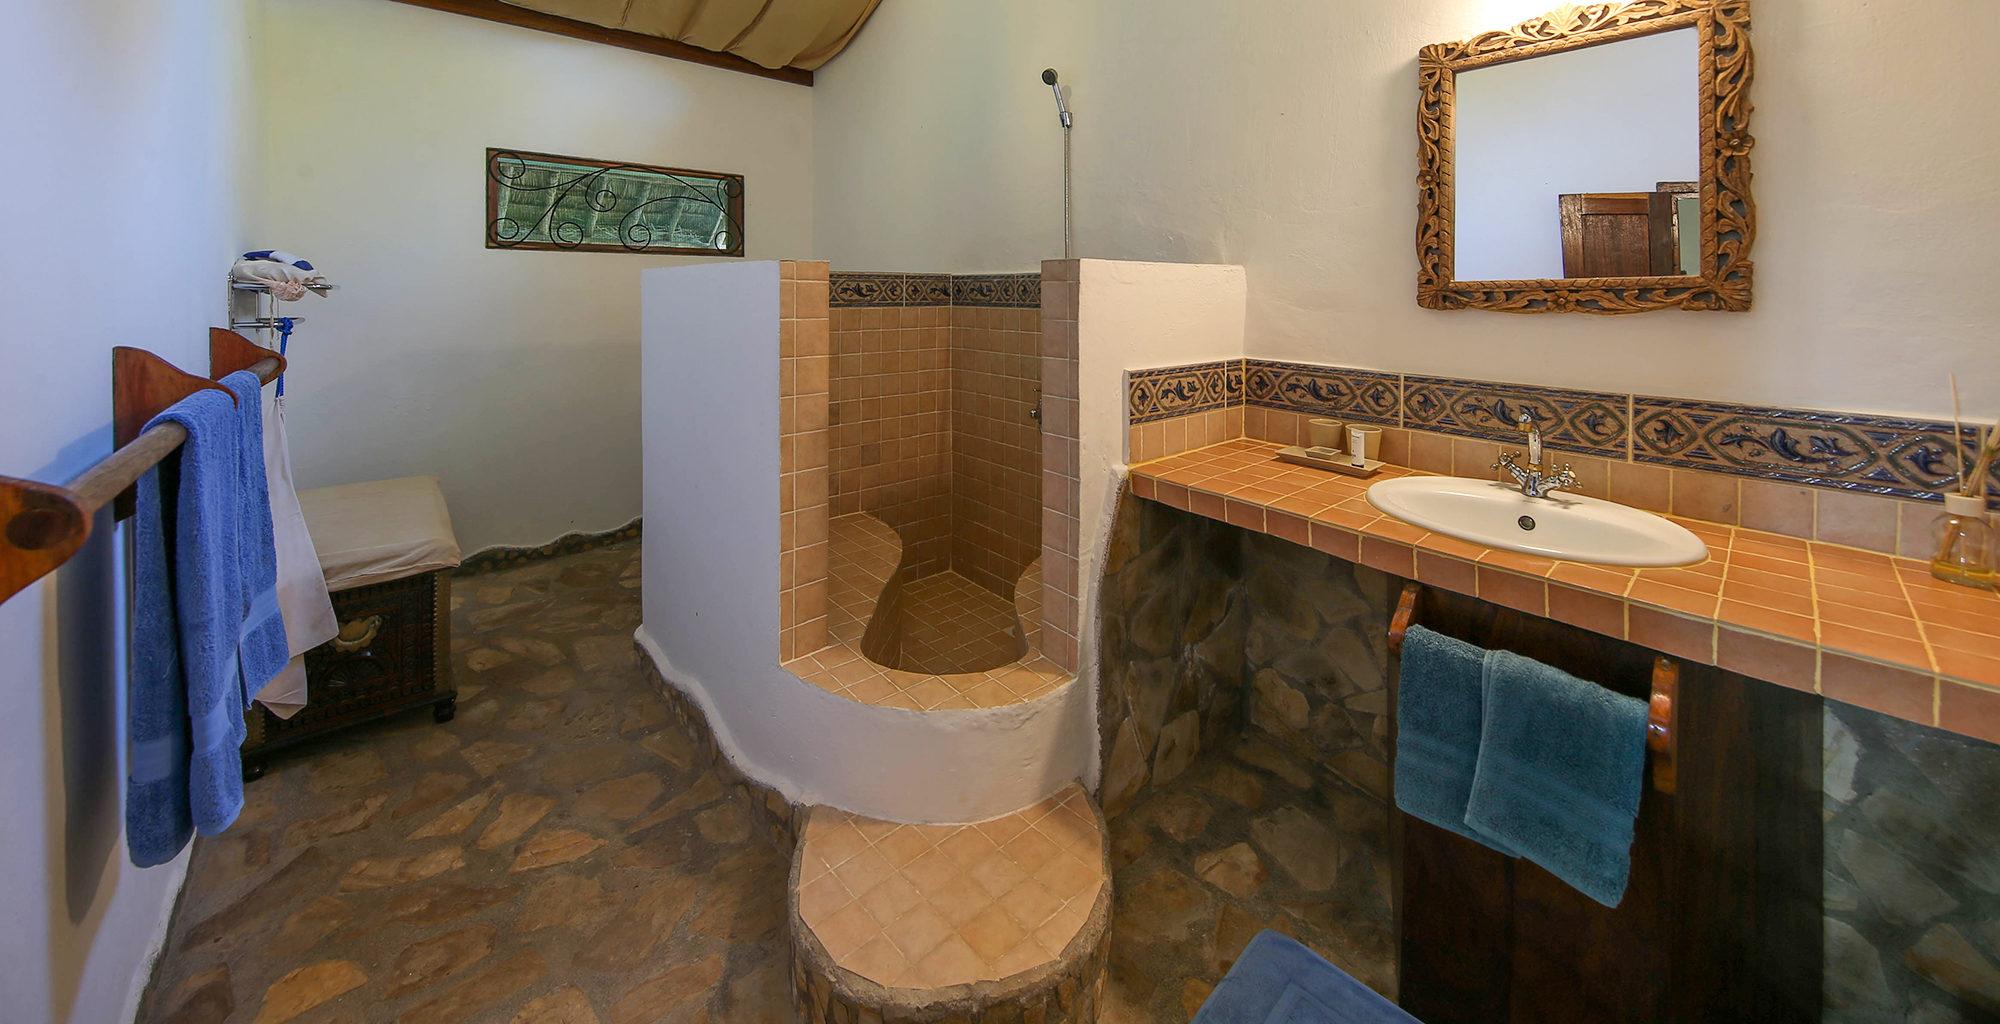 Tanzania-Kinasi-Mafia-Bathroom